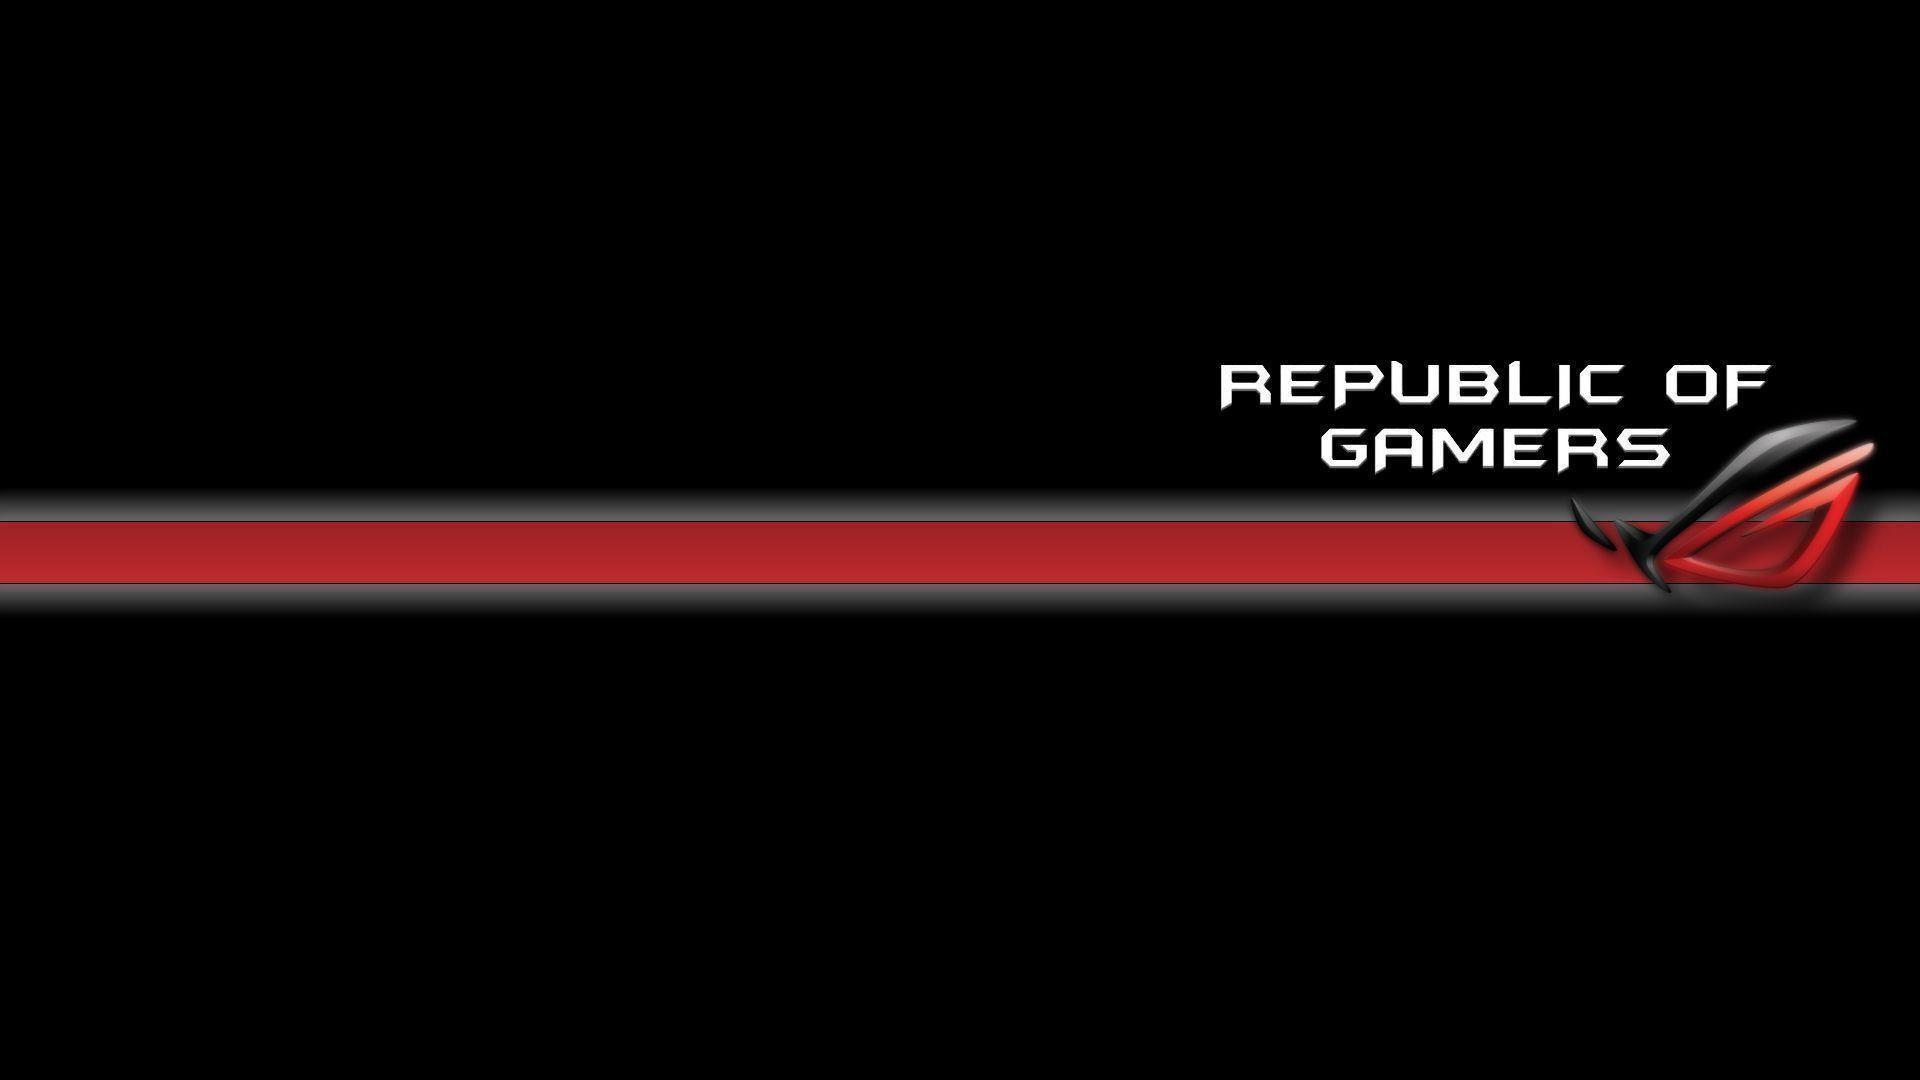 Minimalist Black And Red Asus RoG Wallpaper #1057 | TanukinoSippo.